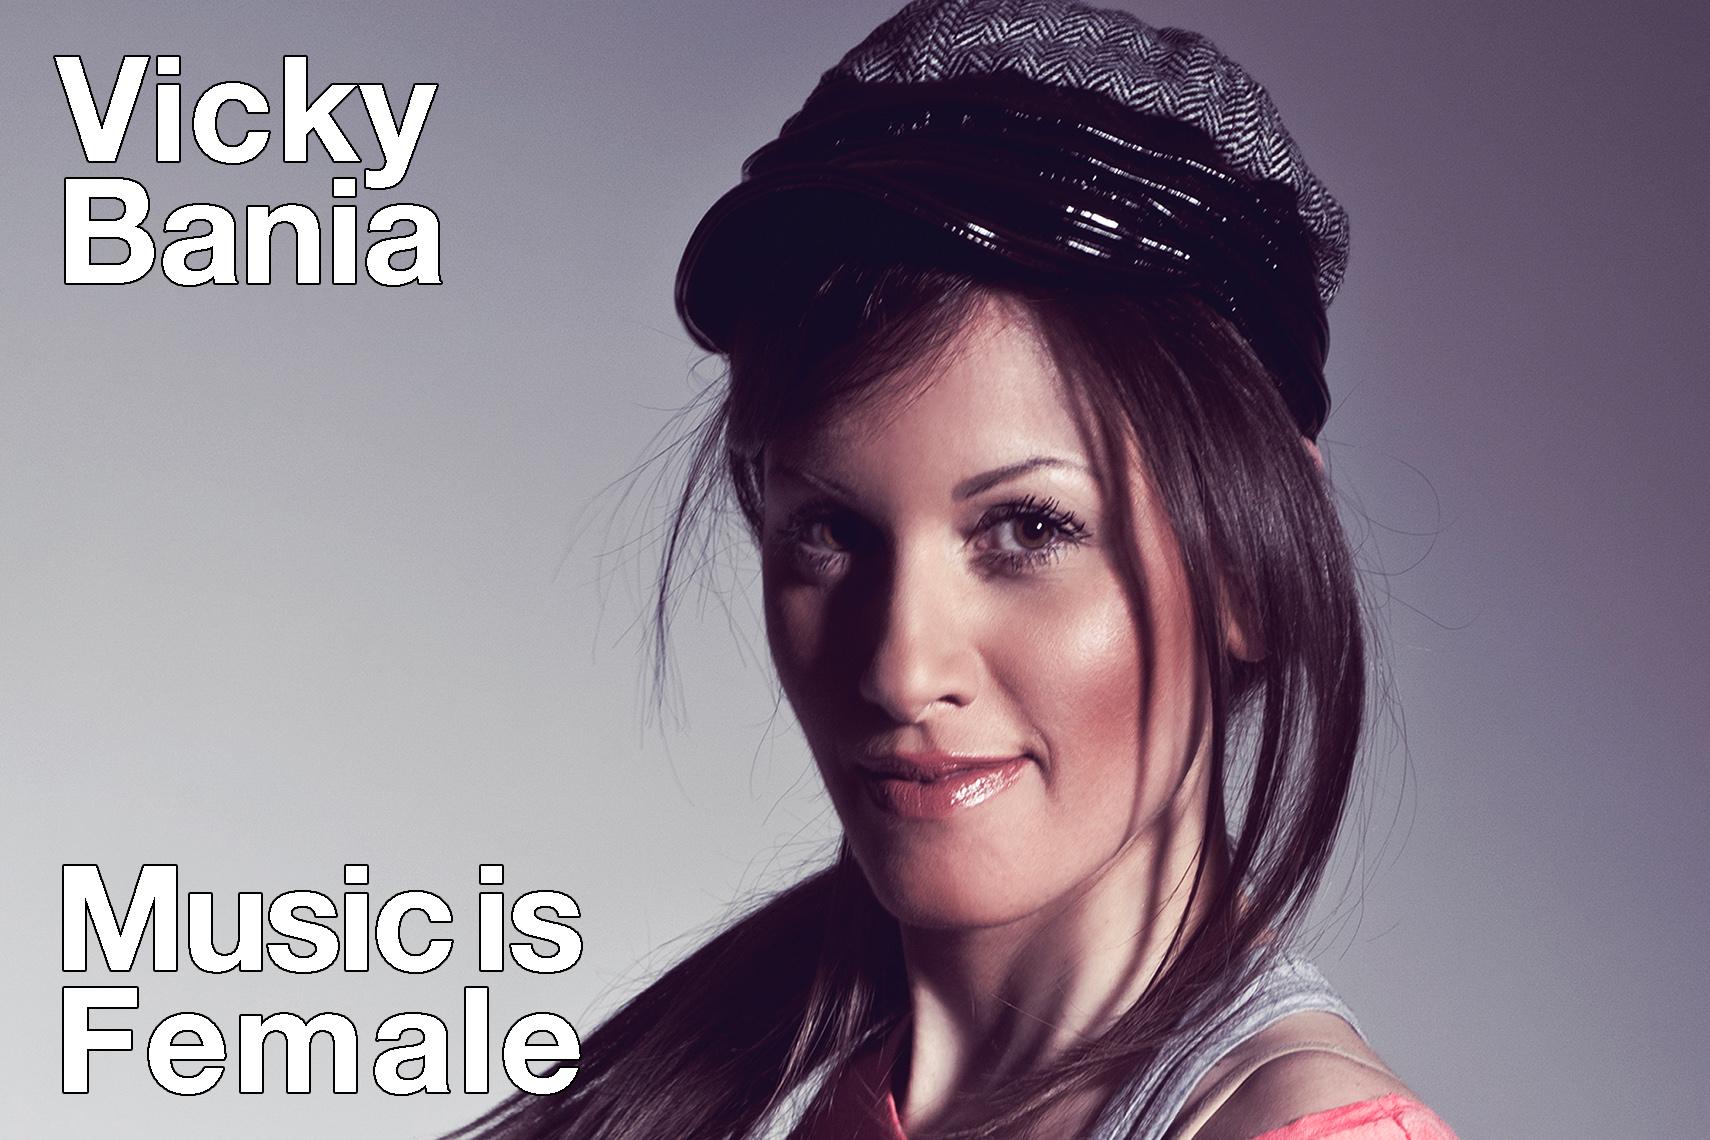 LIVINGCARNIVAL MUSIC IS FEMALE VICKY BANIA